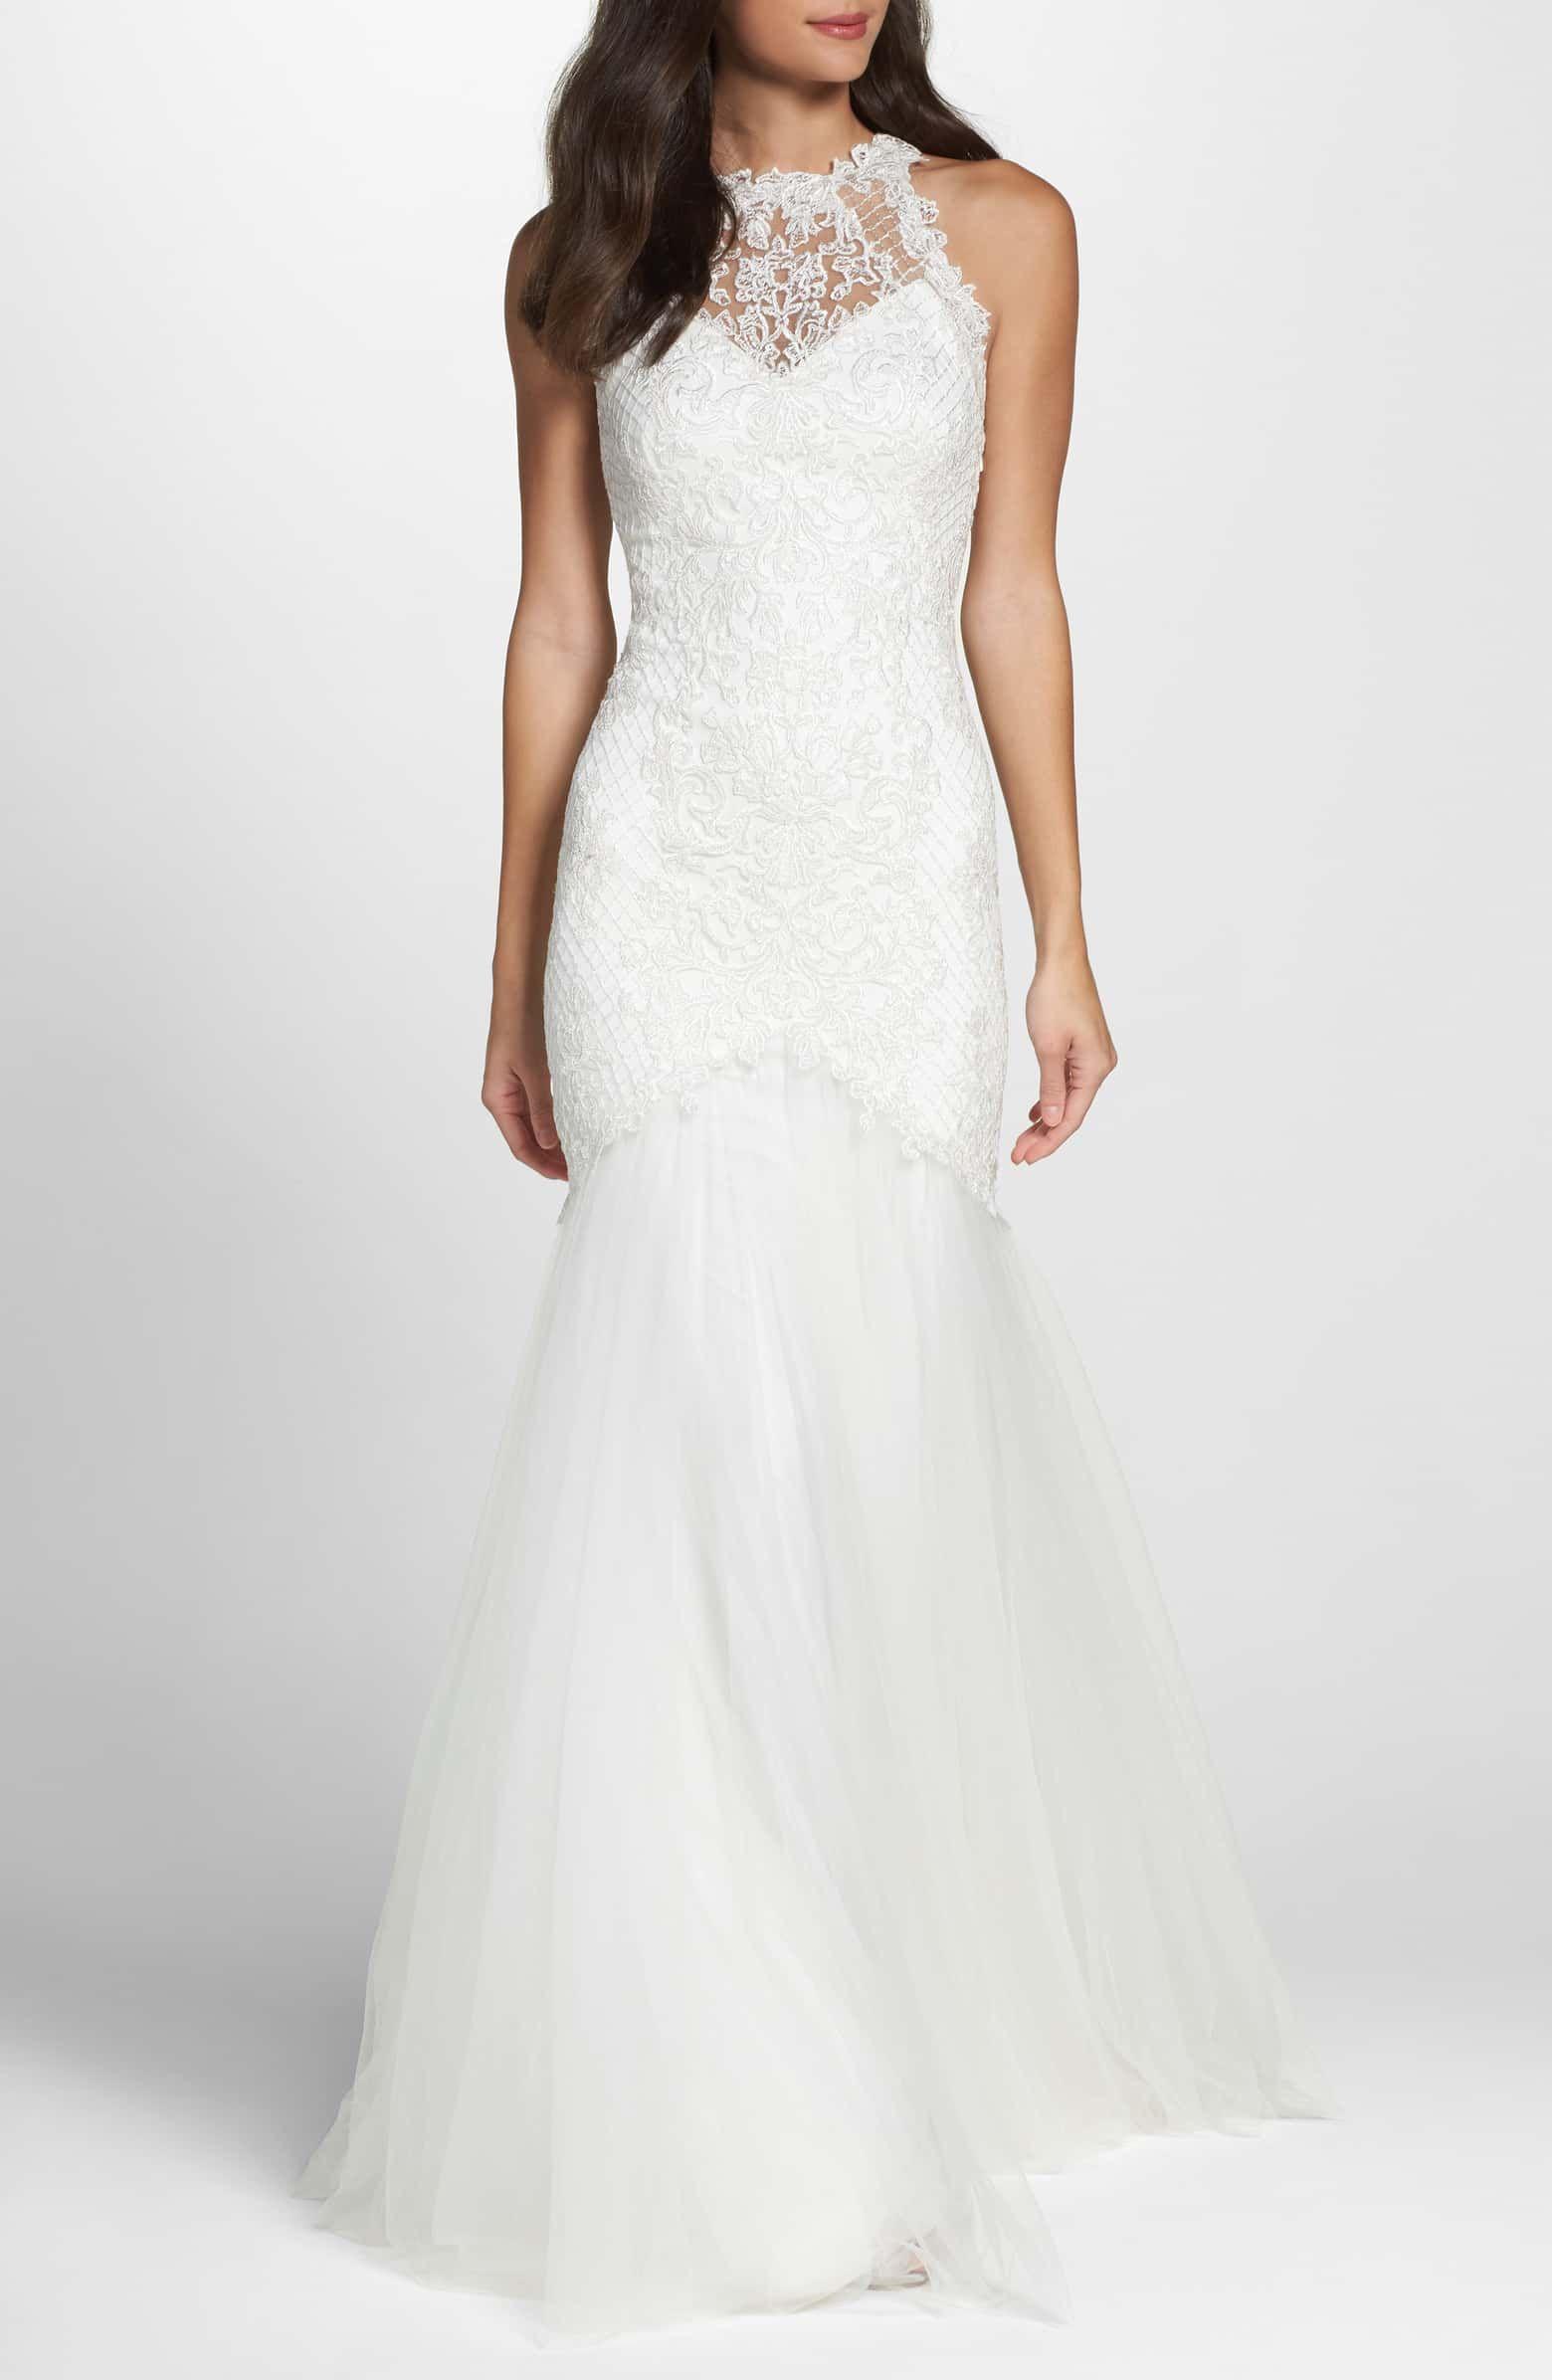 Tadashi Shoji Lace Halter Mermaid Wedding Dress Nordstrom Petite Wedding Dress Wedding Dresses For Petite Women Halter Mermaid Wedding Dress [ 2392 x 1560 Pixel ]